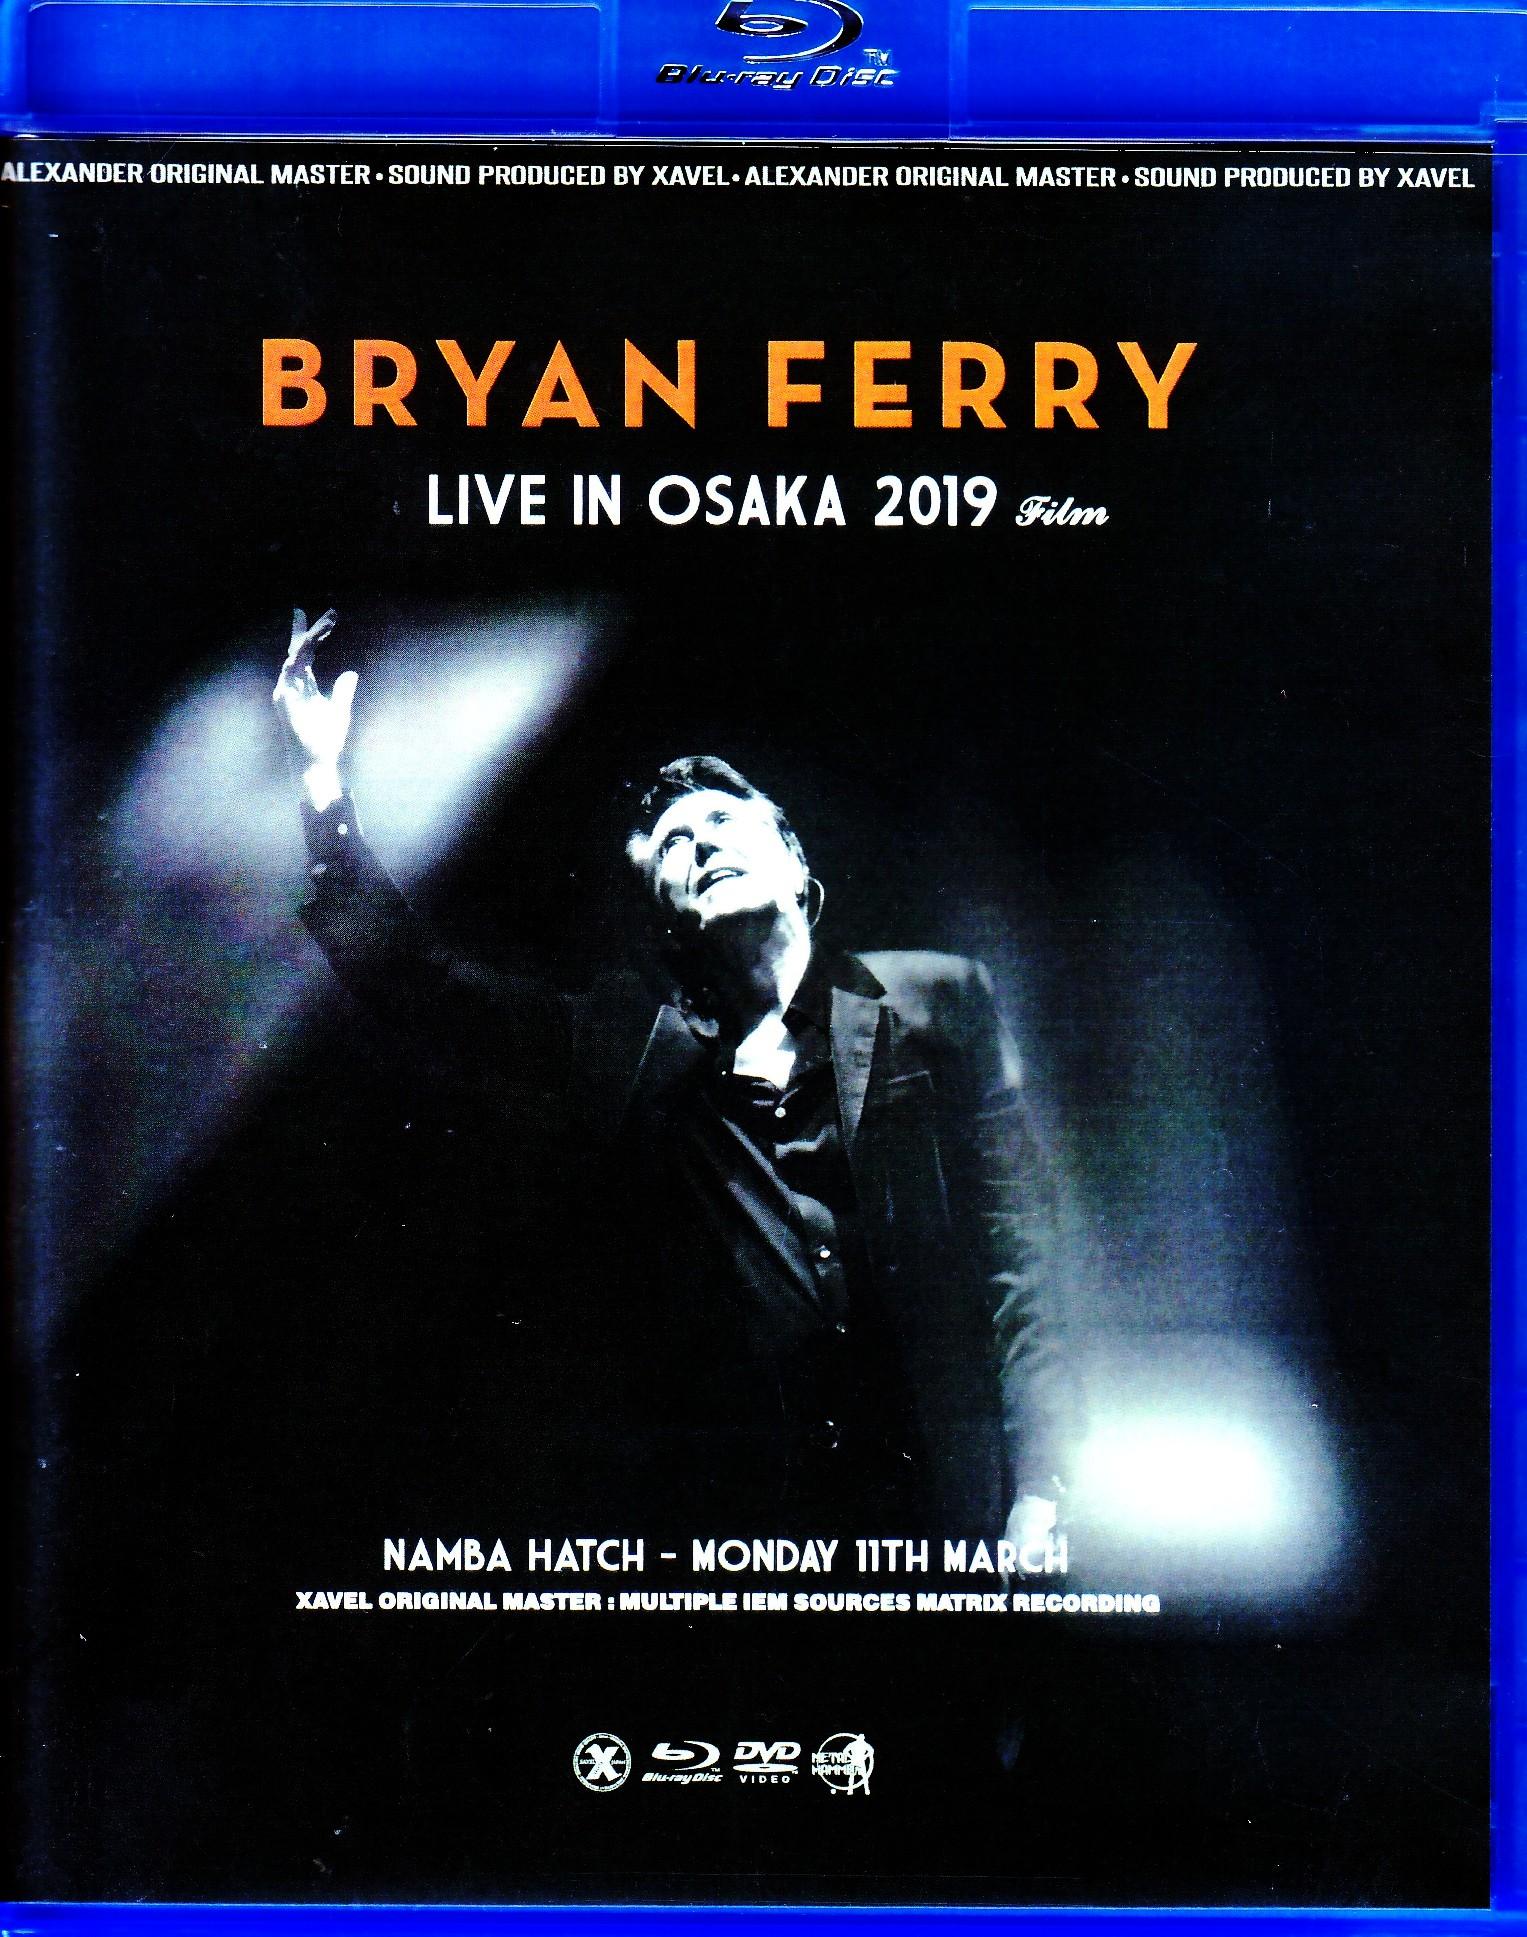 Bryan Ferry ブライアン・フェリー/Osaka,Japan 2019 Blu-Ray・DVD IEM Matrix Ver.